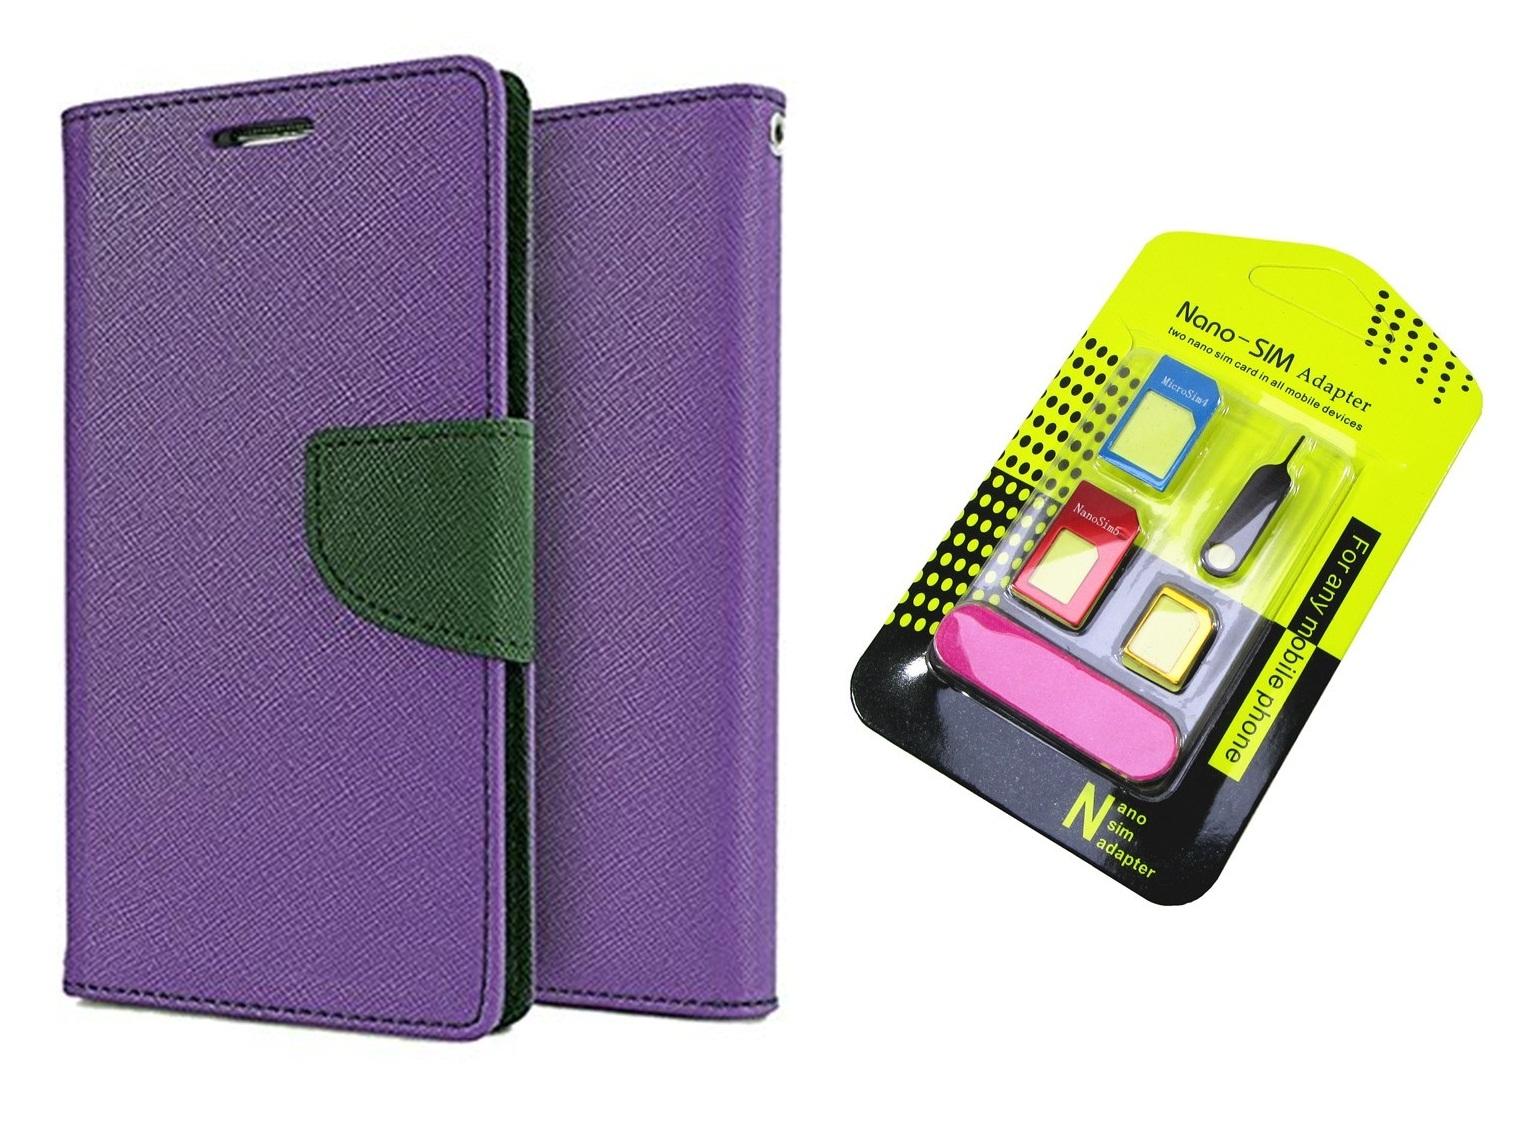 Wallet Flip Cover For Motorola Moto G  2nd Gen  / Moto G2   PURPLE With Nano Sim Adapter